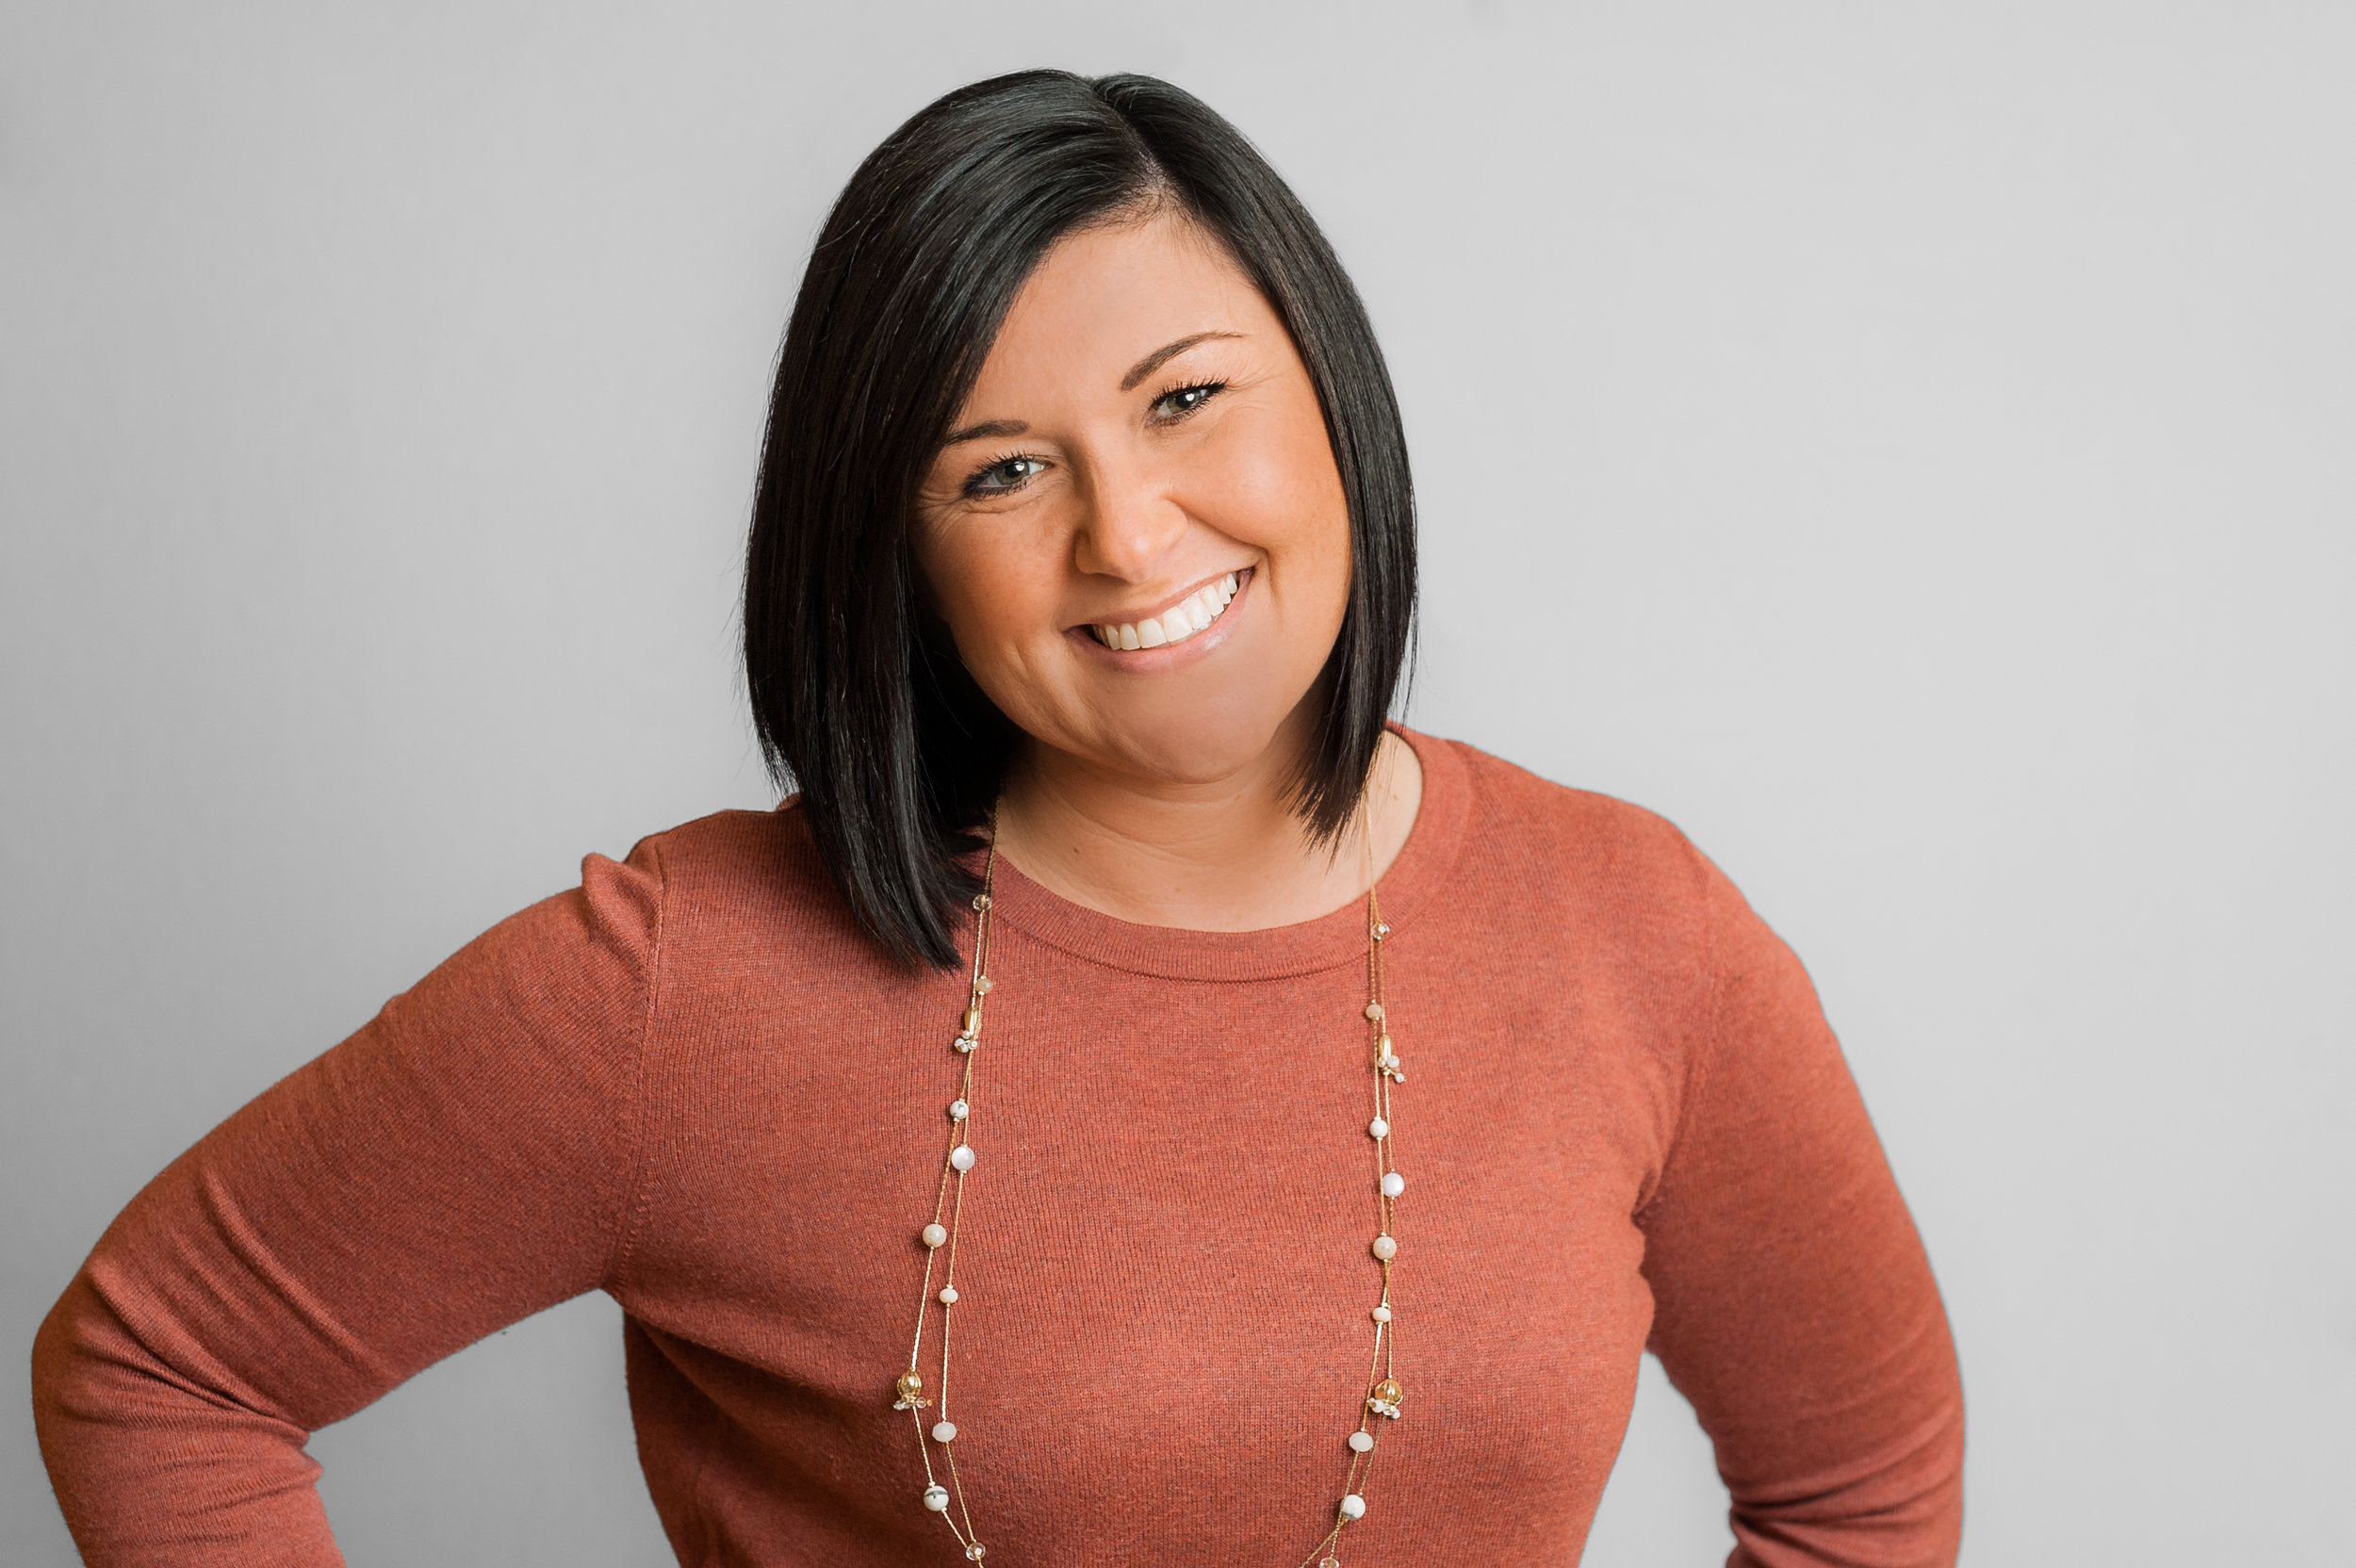 MEET Melissa Bagnall - LCSW, BCD